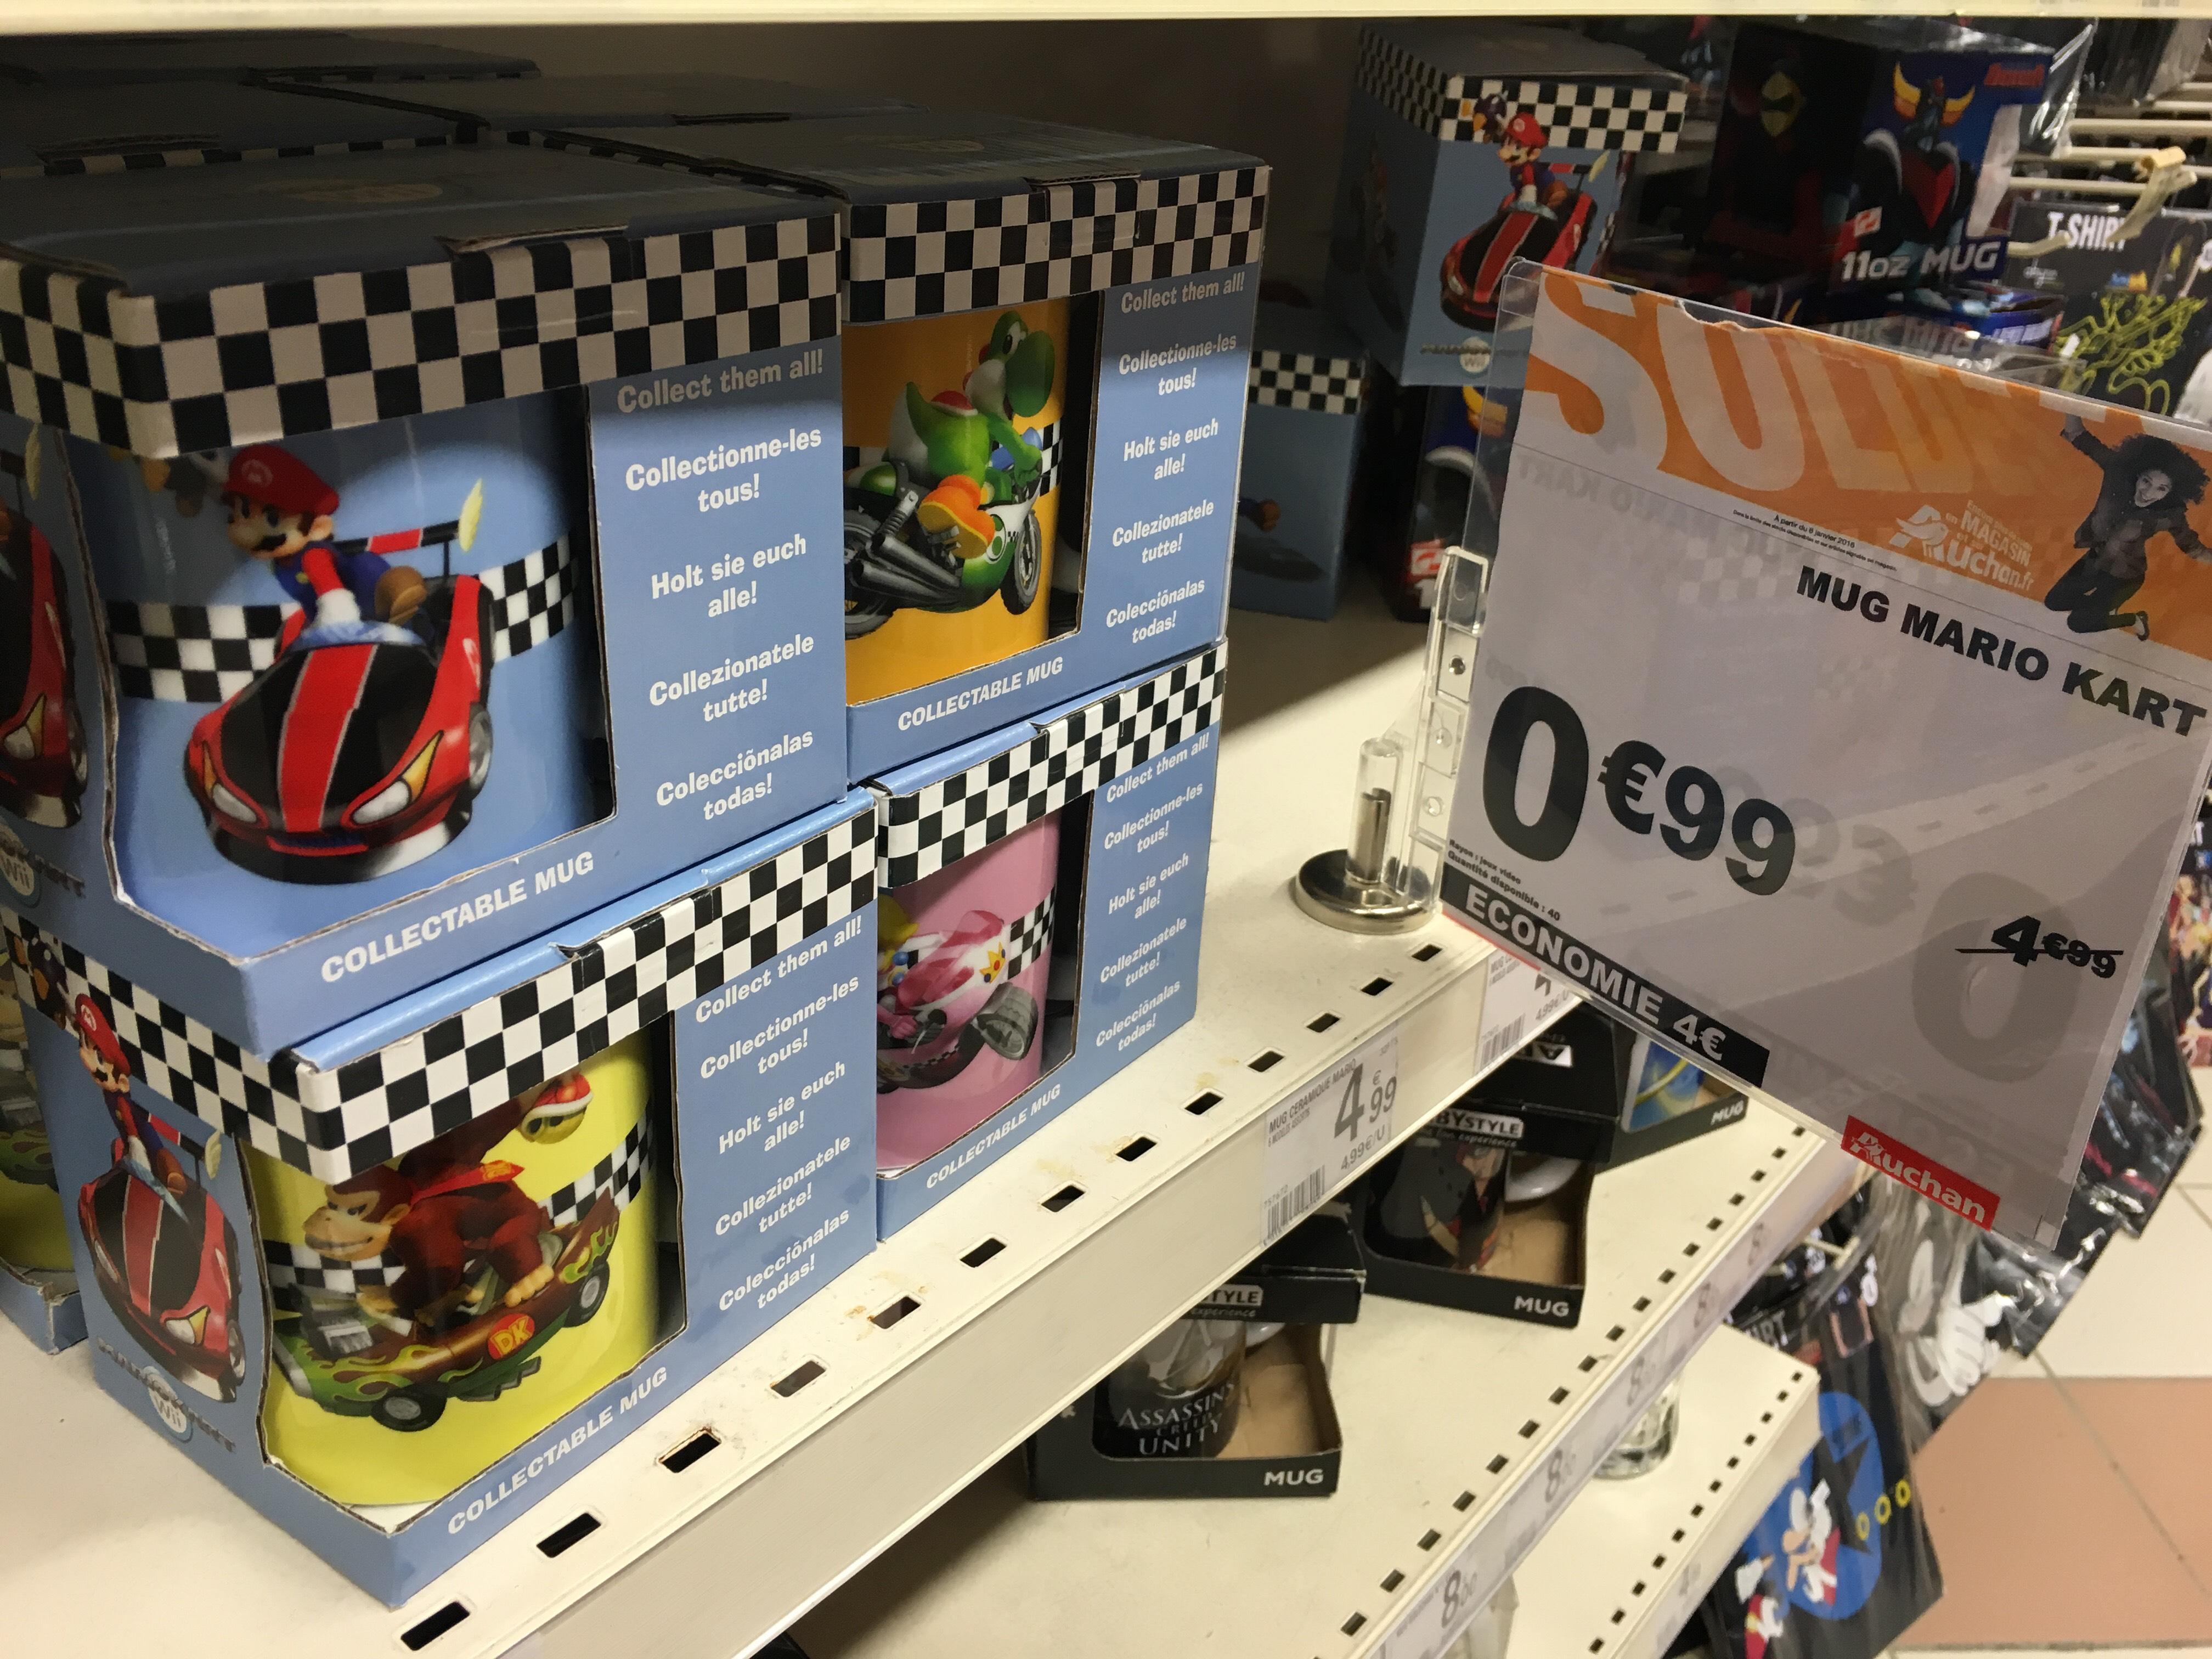 Mug Mario Kart - Plusieurs modèles